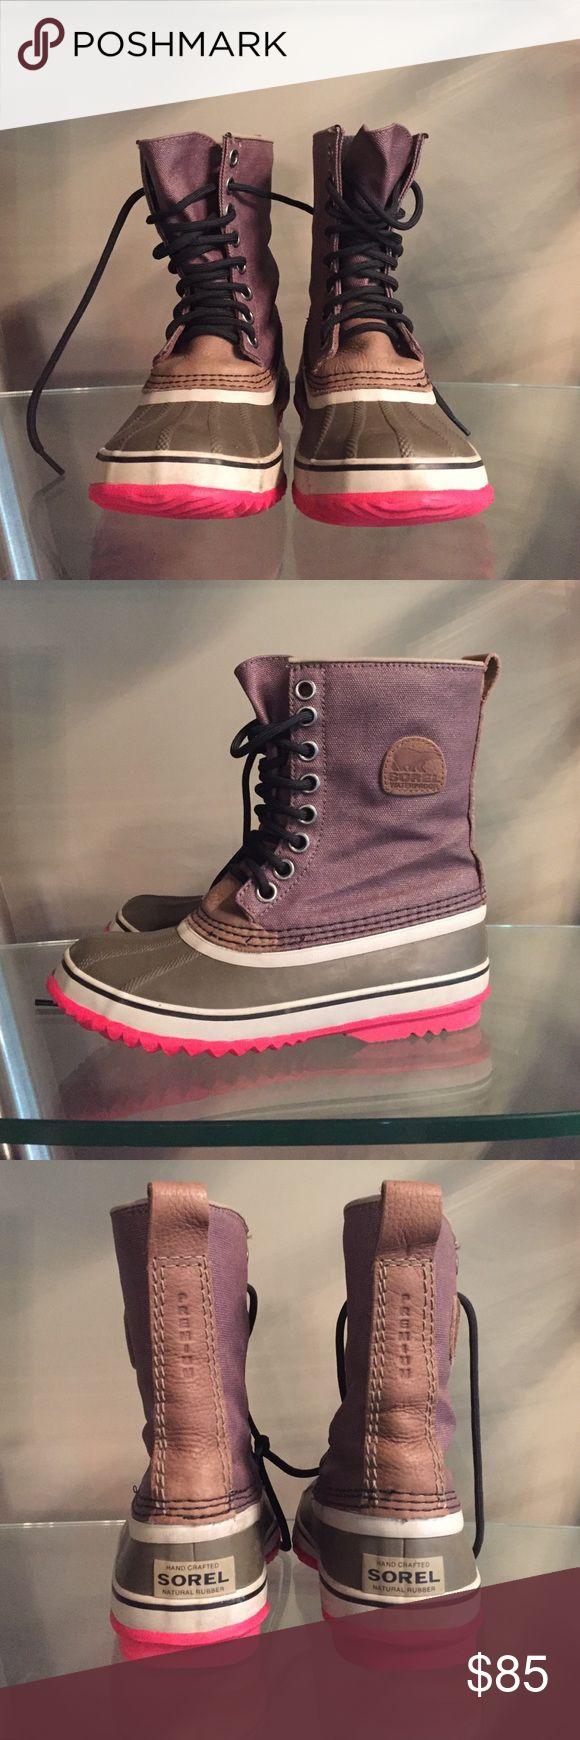 SOREL Premium Waterproof Winter Duck Boots 6 SOREL Premium Waterproof Winter Duck Boots 6. Fossil color with pink soles. Great condition! Black laces. Women's size 6. Sorel Shoes Winter & Rain Boots